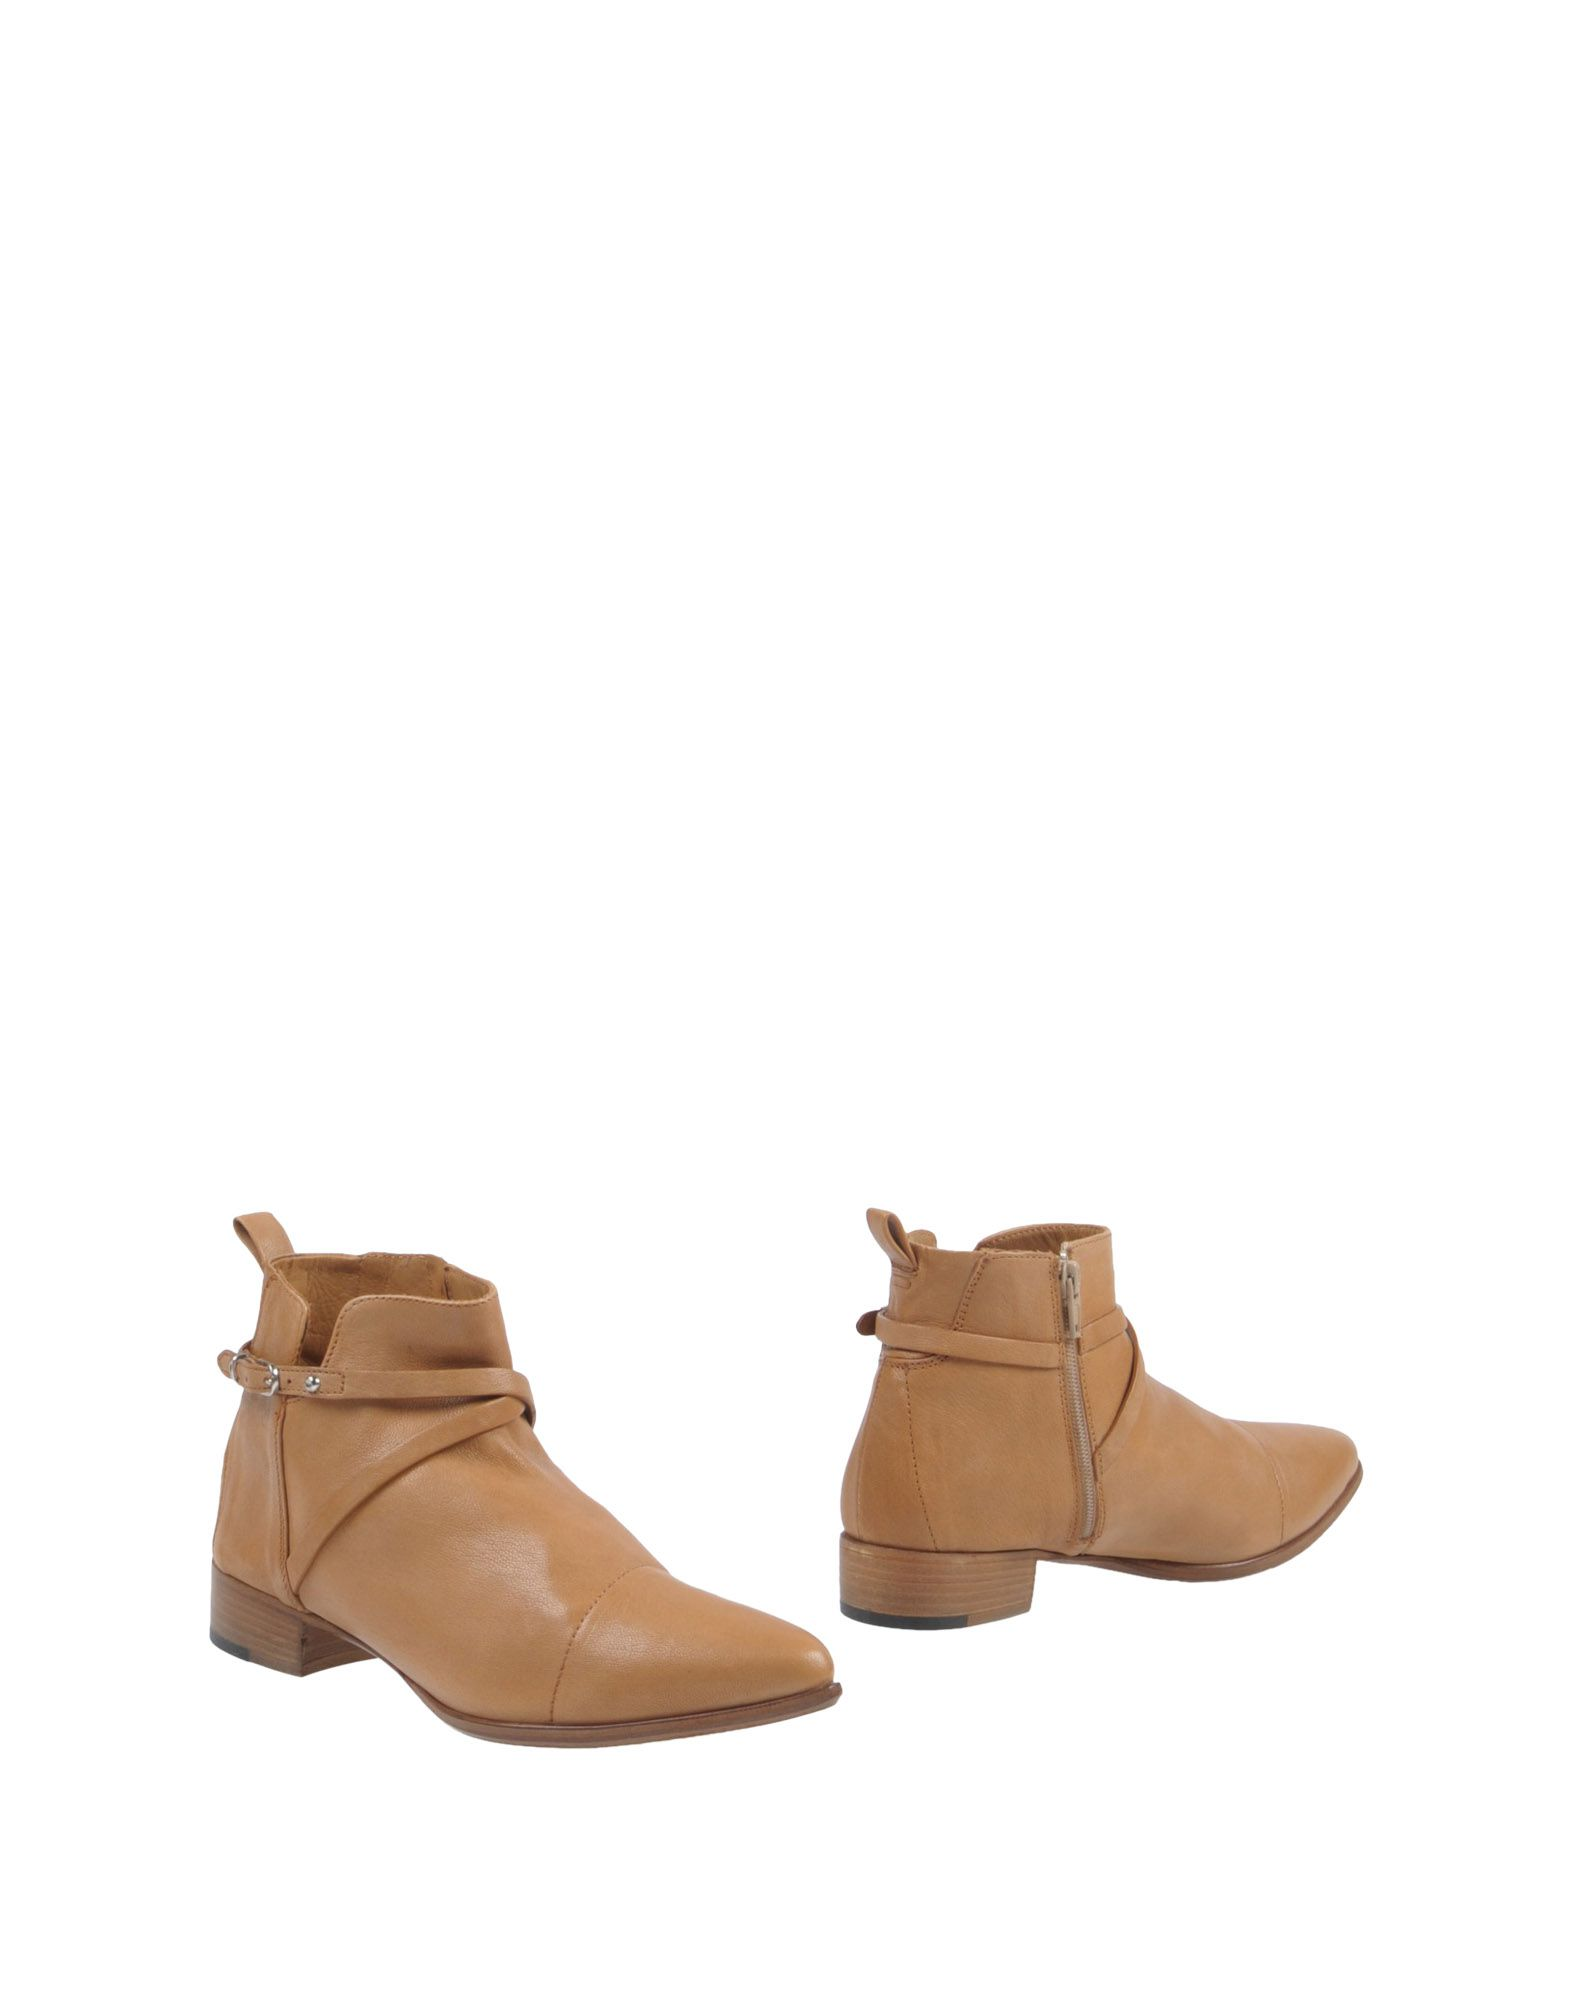 Spaziomoda Stiefelette Damen Heiße  11448572XV Heiße Damen Schuhe 84921b